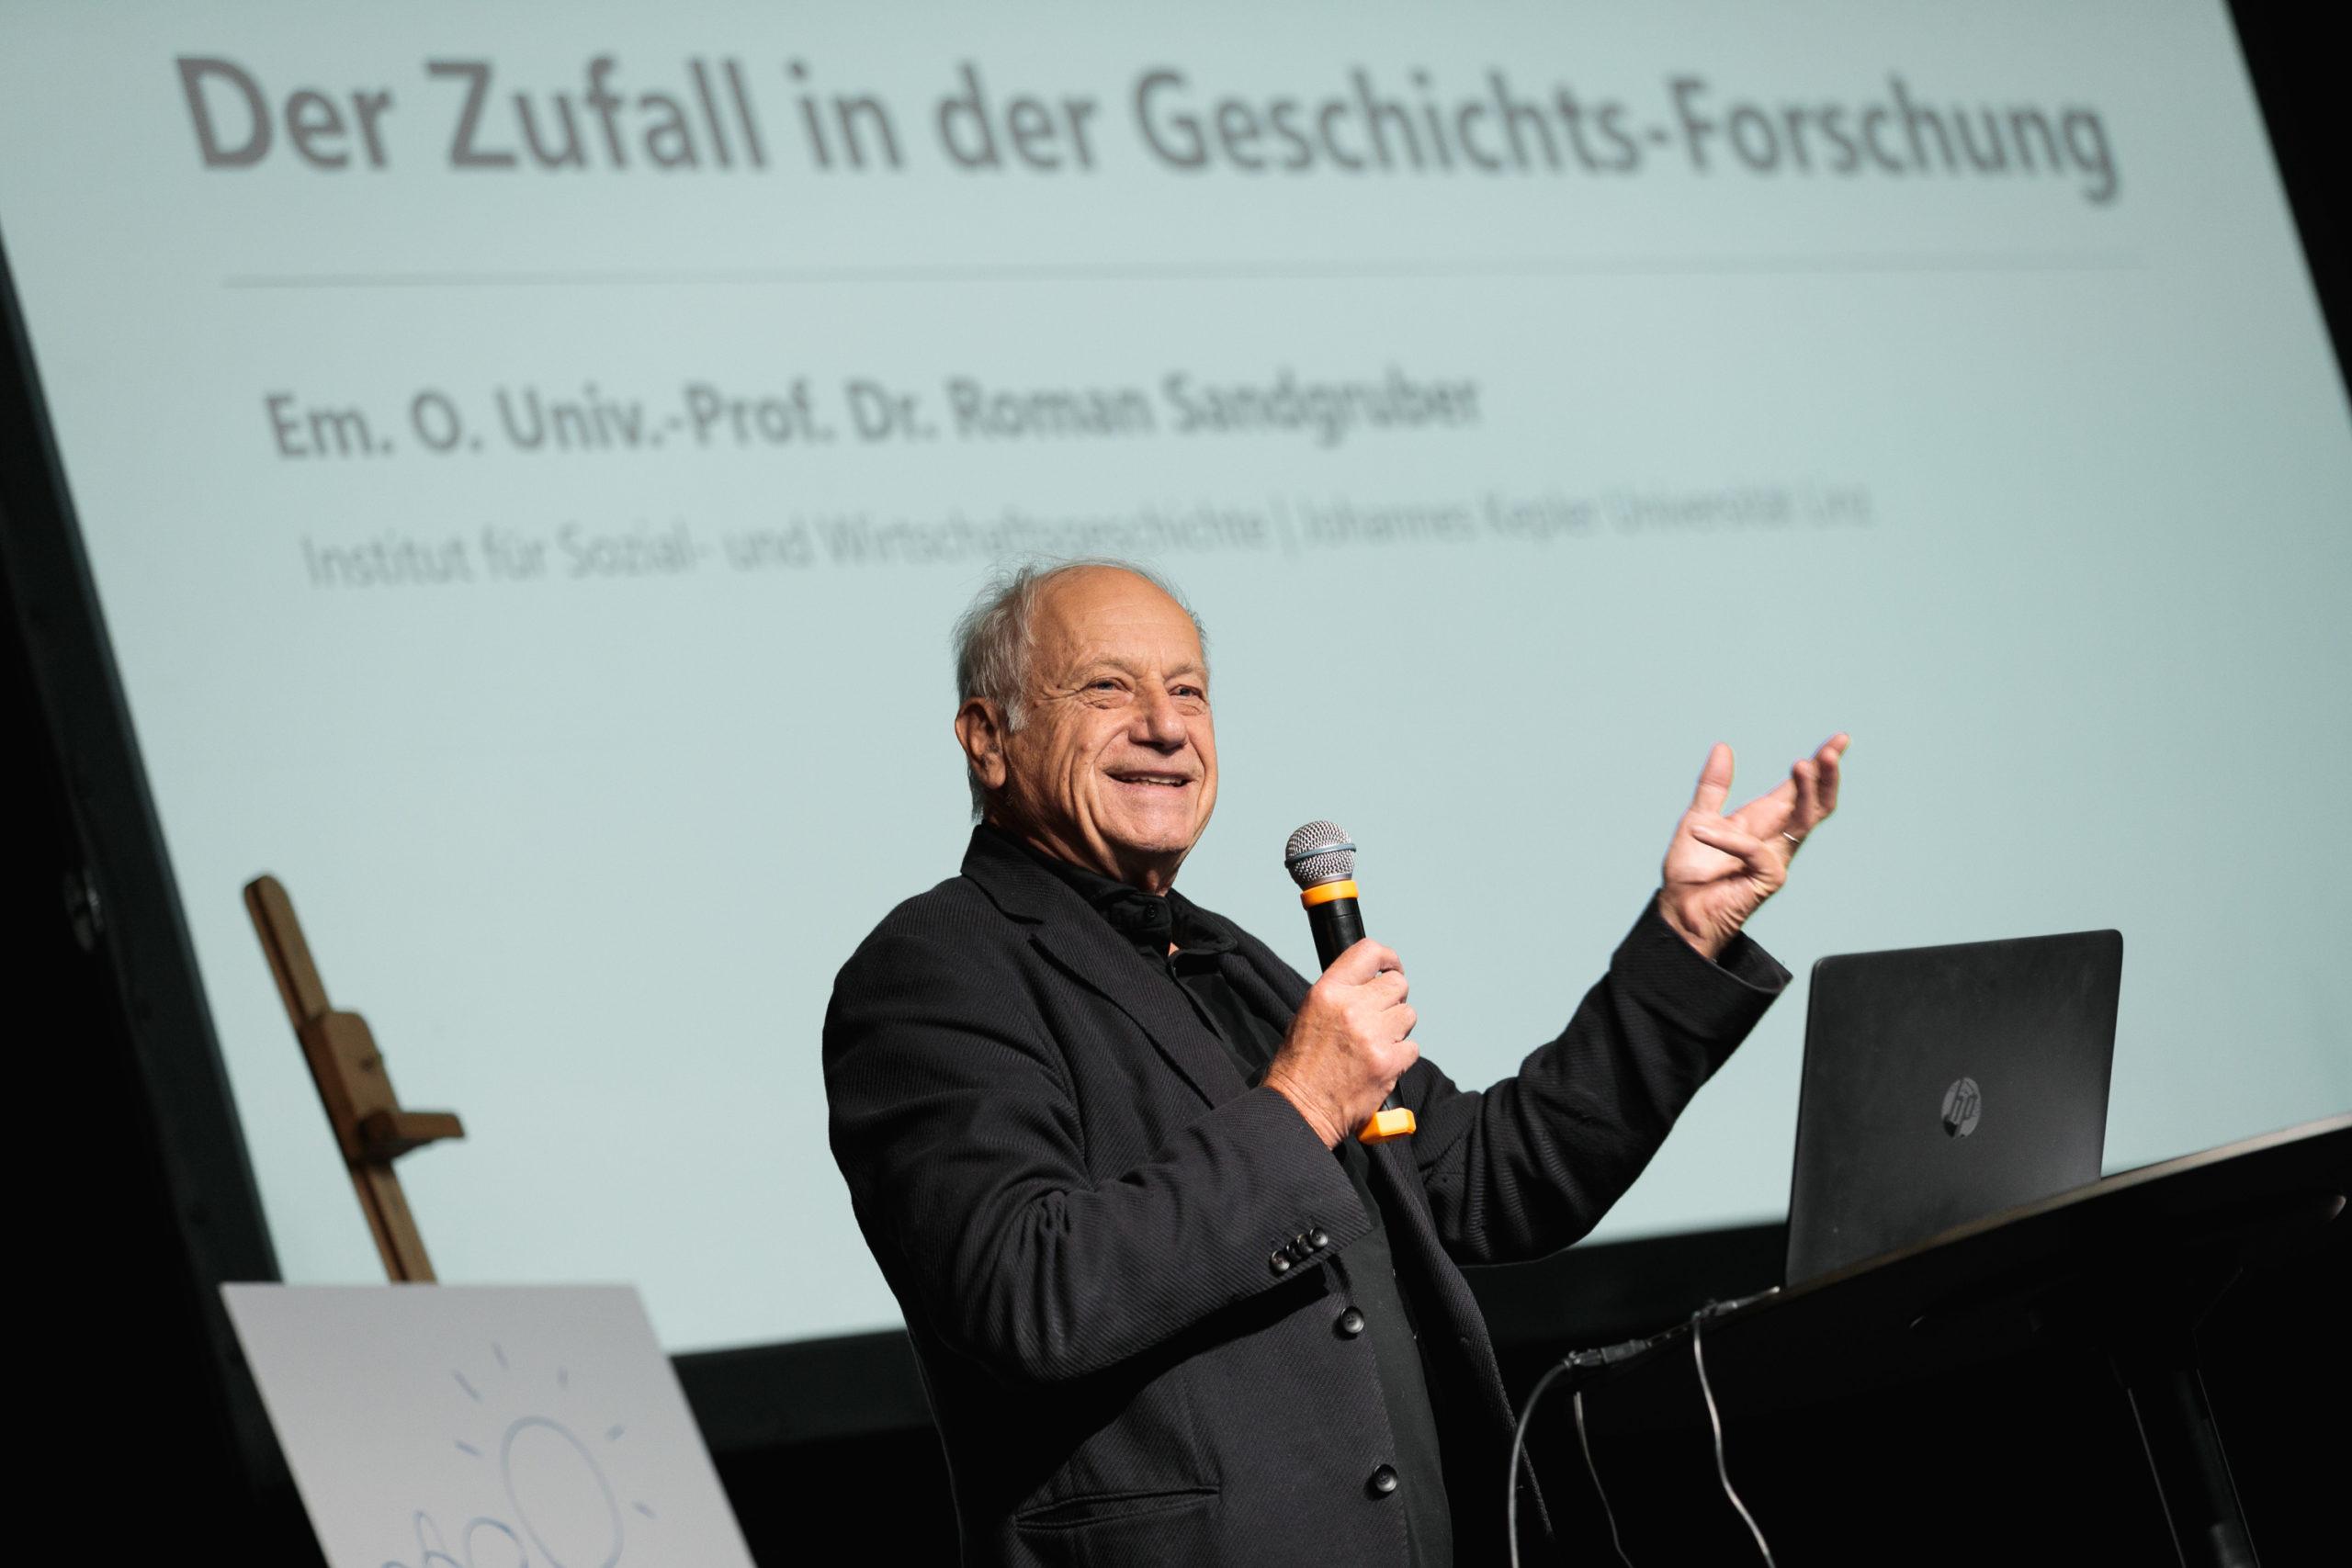 Foto 4: em. o. Univ.-Prof. Dr. Roman Sandgruber, Foto: vog.photo